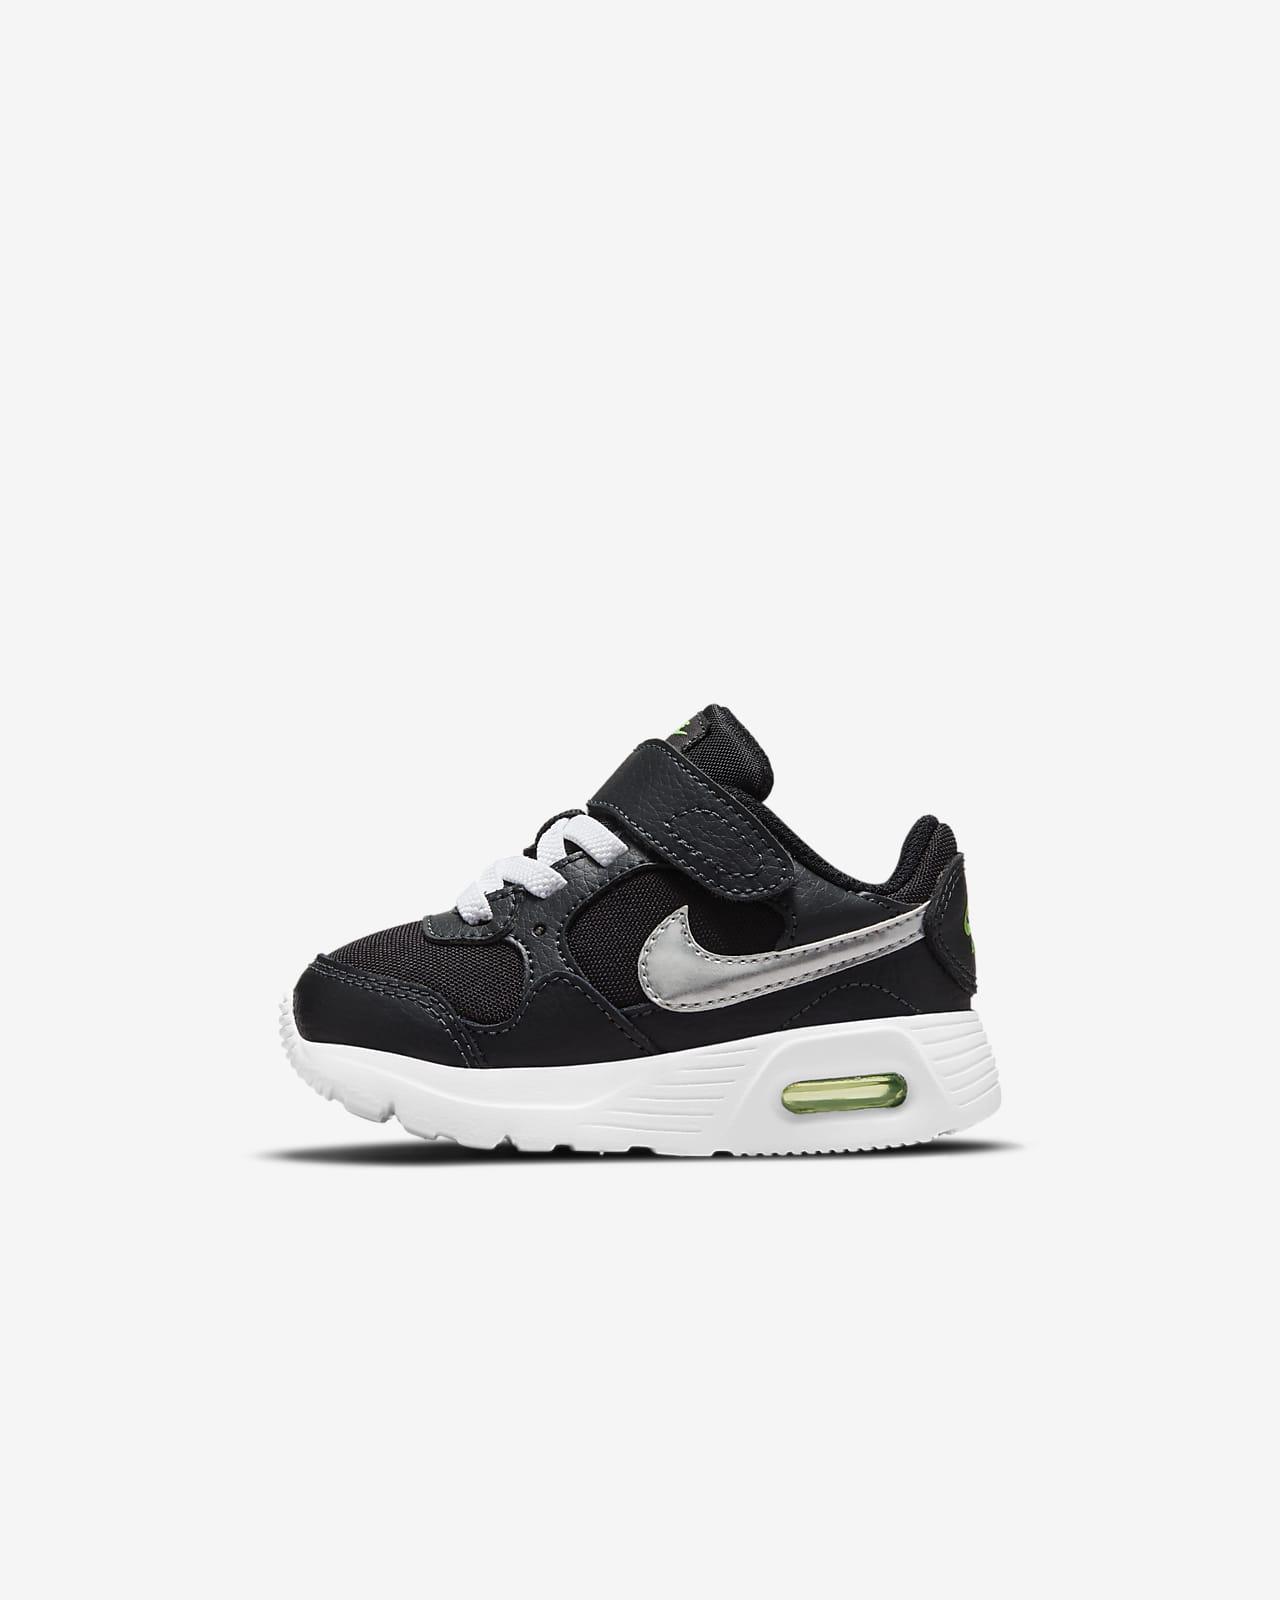 Nike Air Max SC Baby/Toddler Shoes